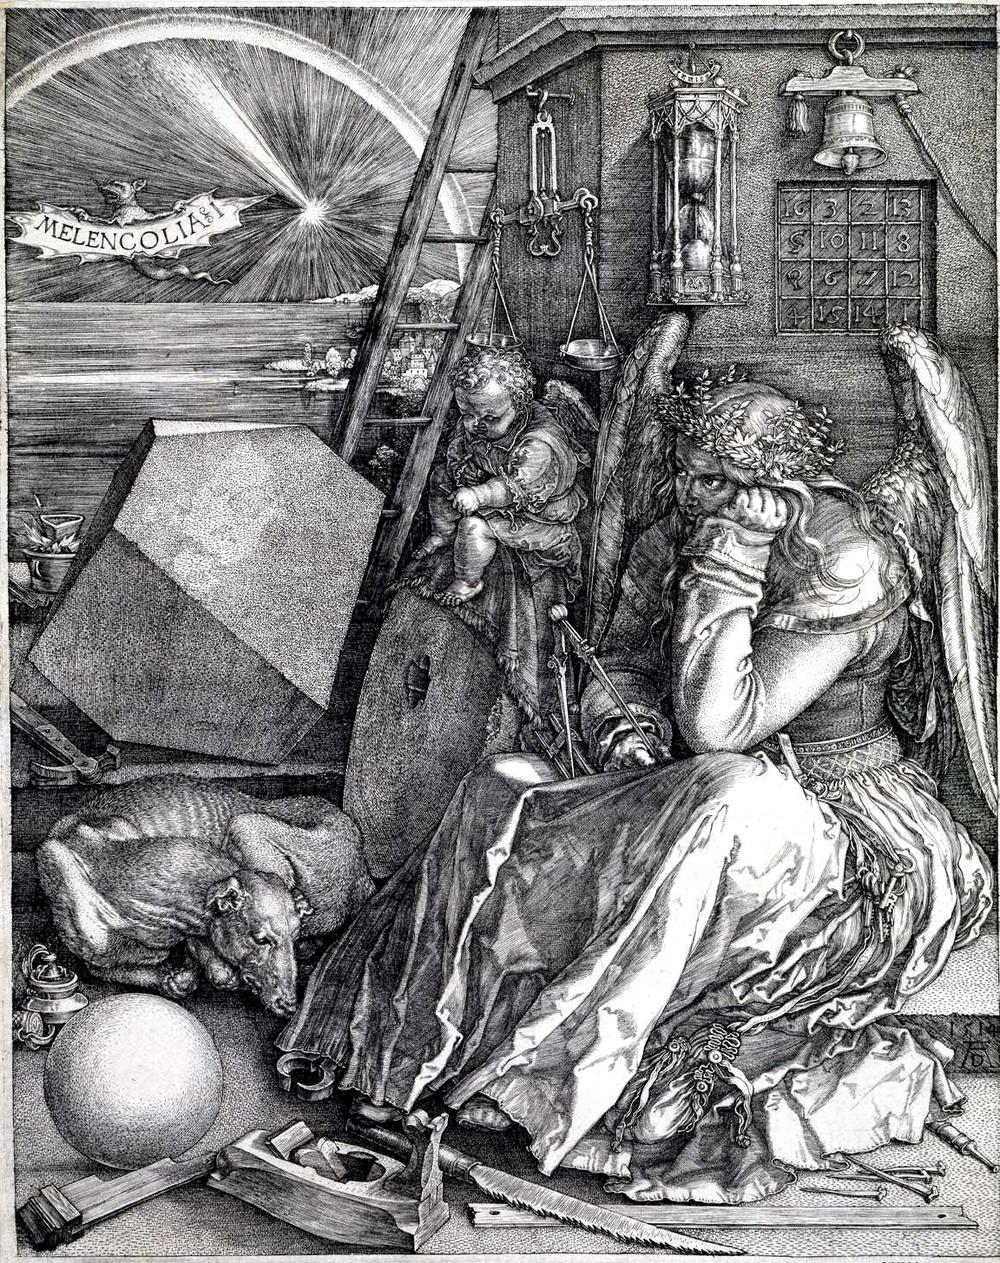 Albrecht Dürer, Melencolia, 1514